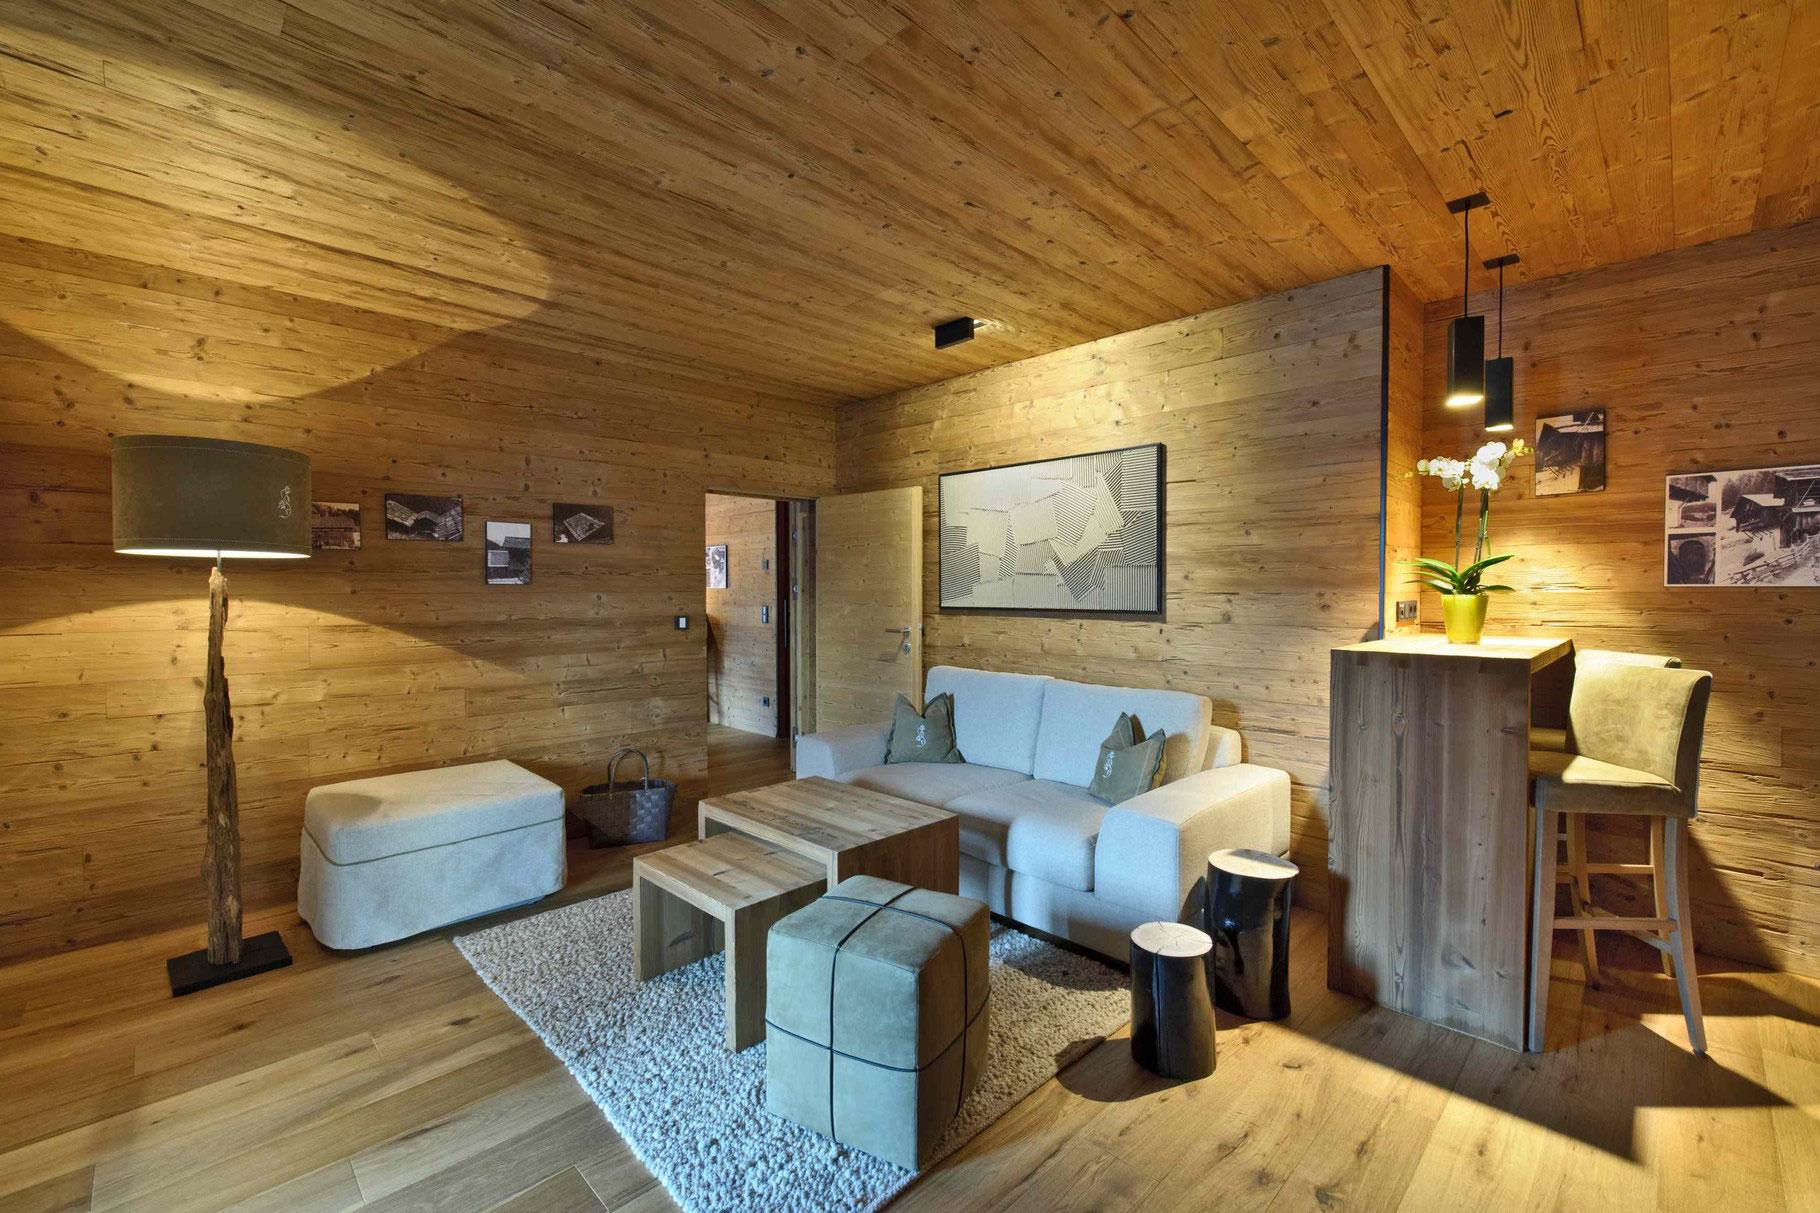 mont blanc moso bambusparkett bambusplatten bambus x treme flexbamboo bambus. Black Bedroom Furniture Sets. Home Design Ideas